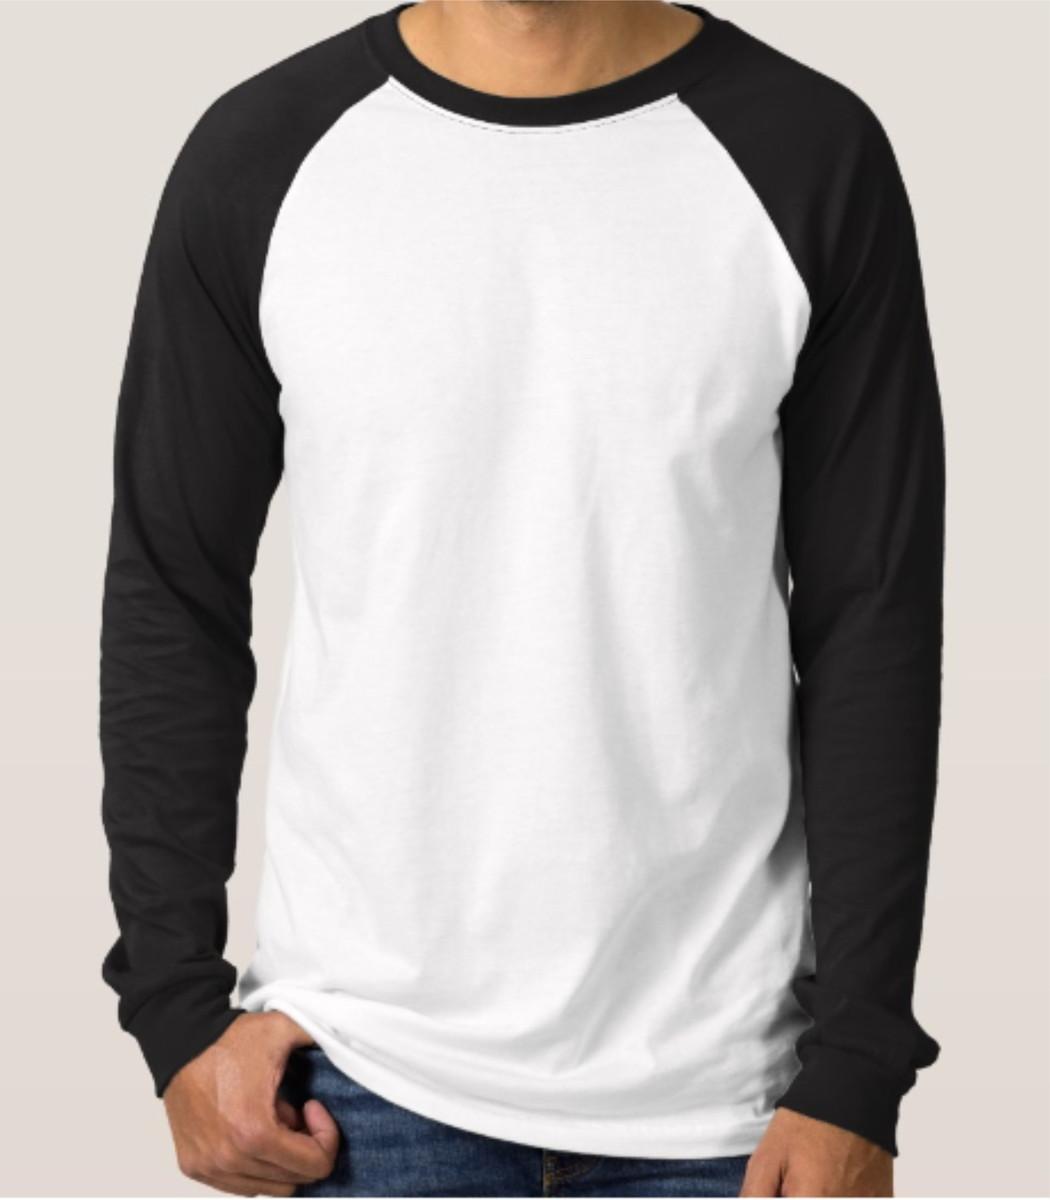 4fd4dbae6d Camisa raglan manga colorida longa INFANTIL no Elo7